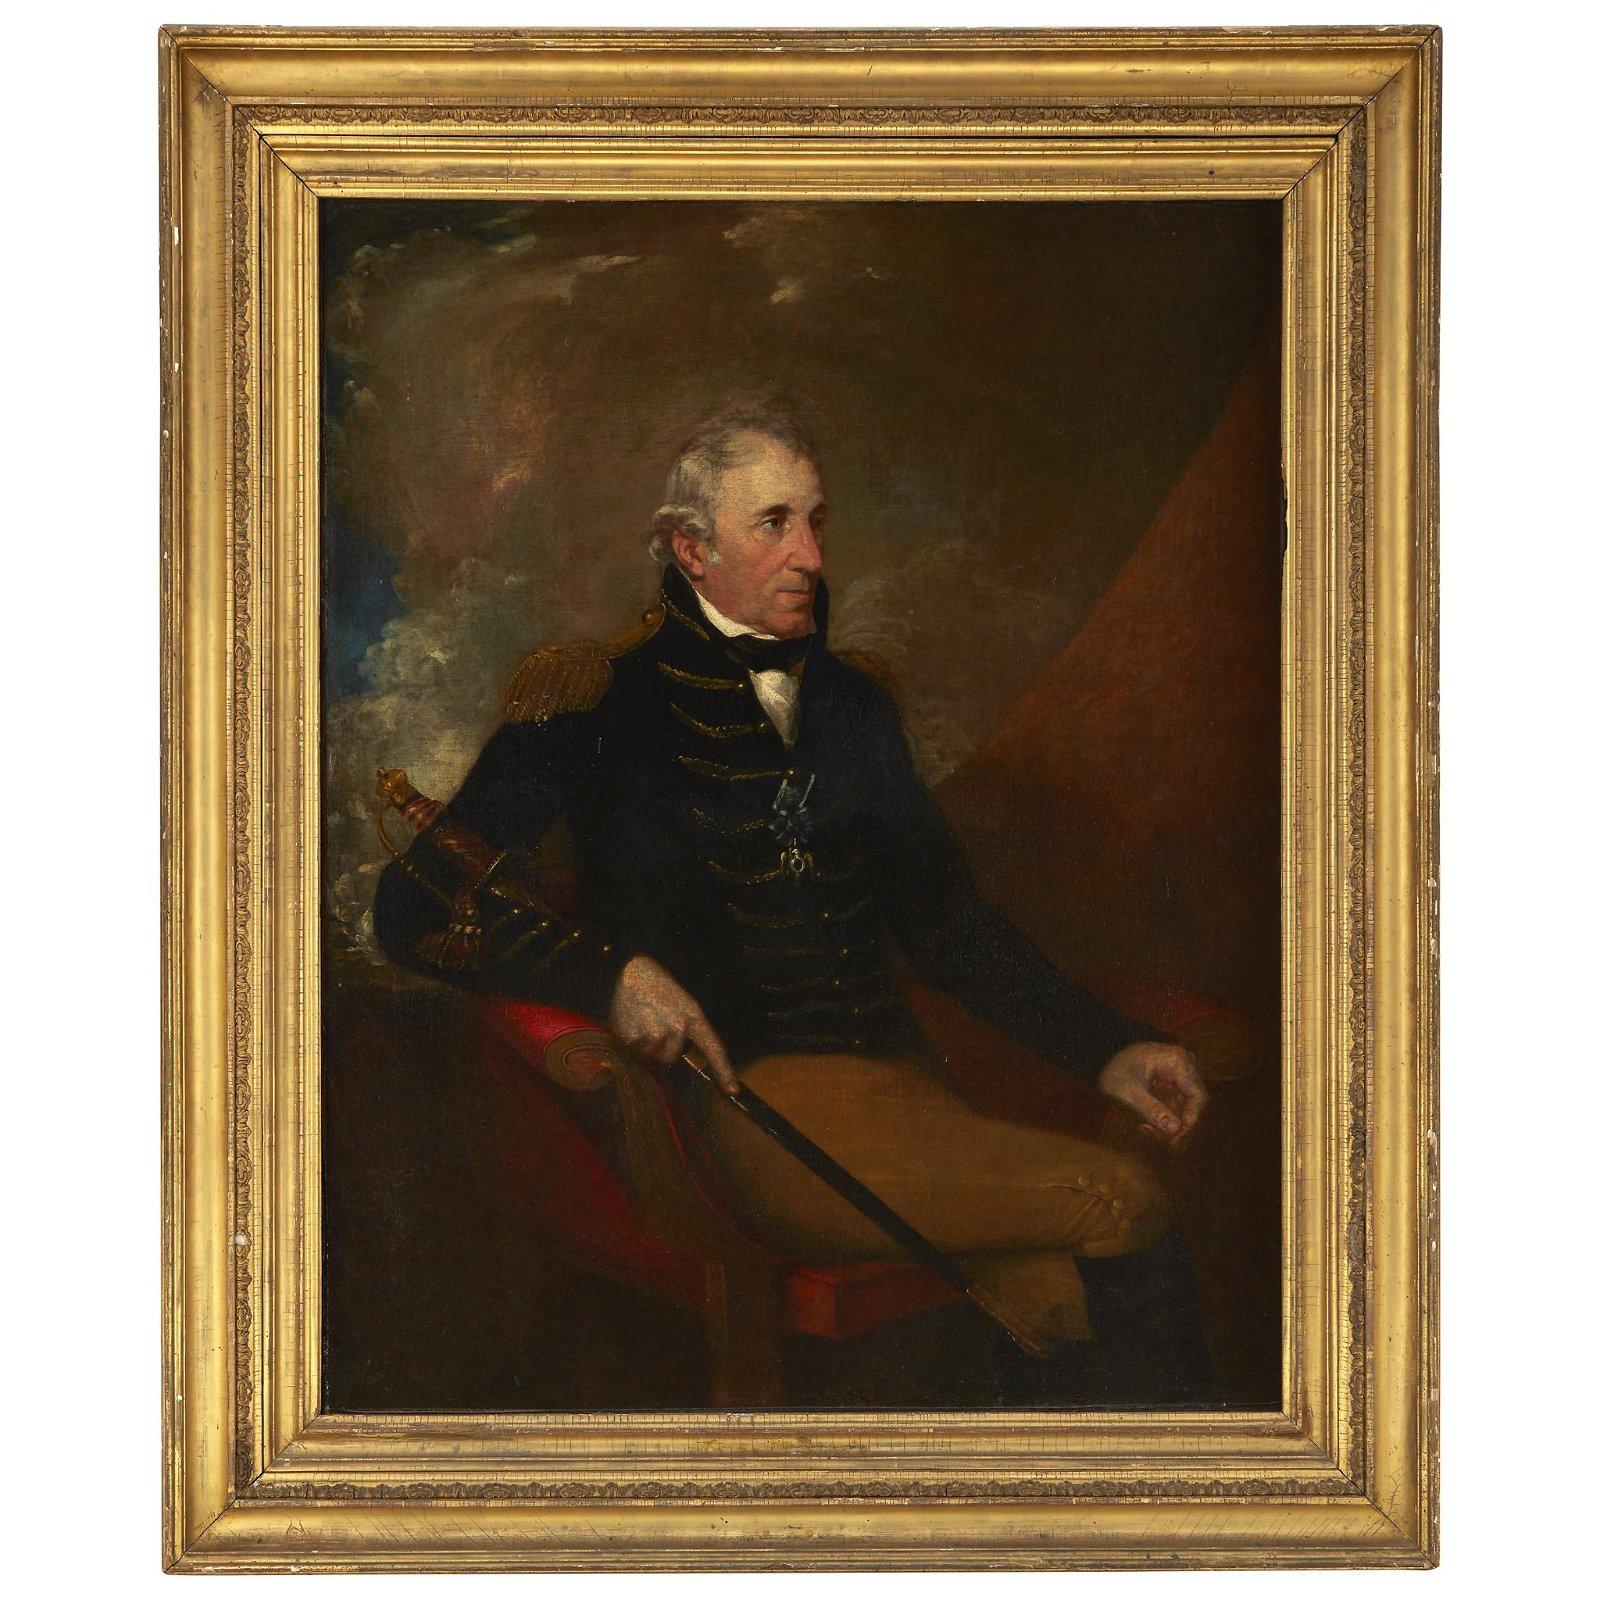 Samuel Finley Breese Morse (1791-1828), Portrait of